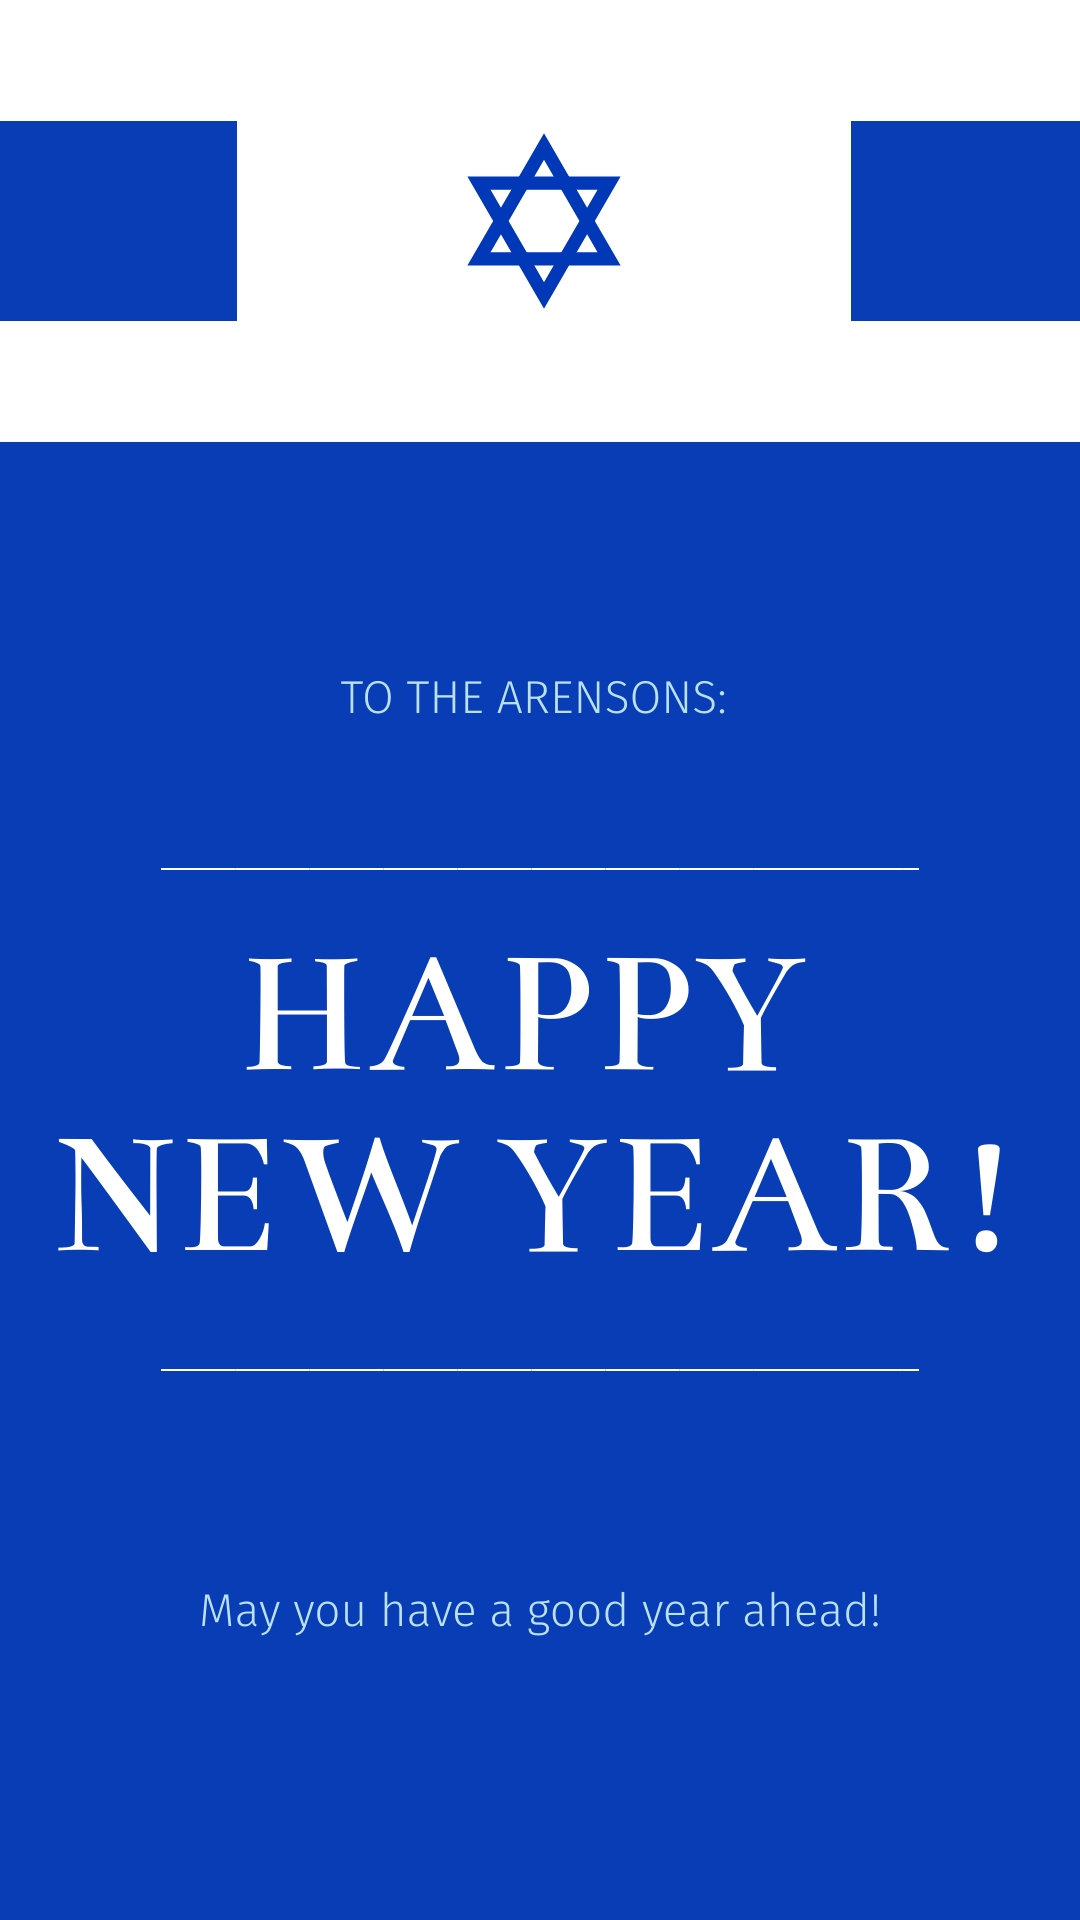 Jewish New Year Wish Animated Vertical Template